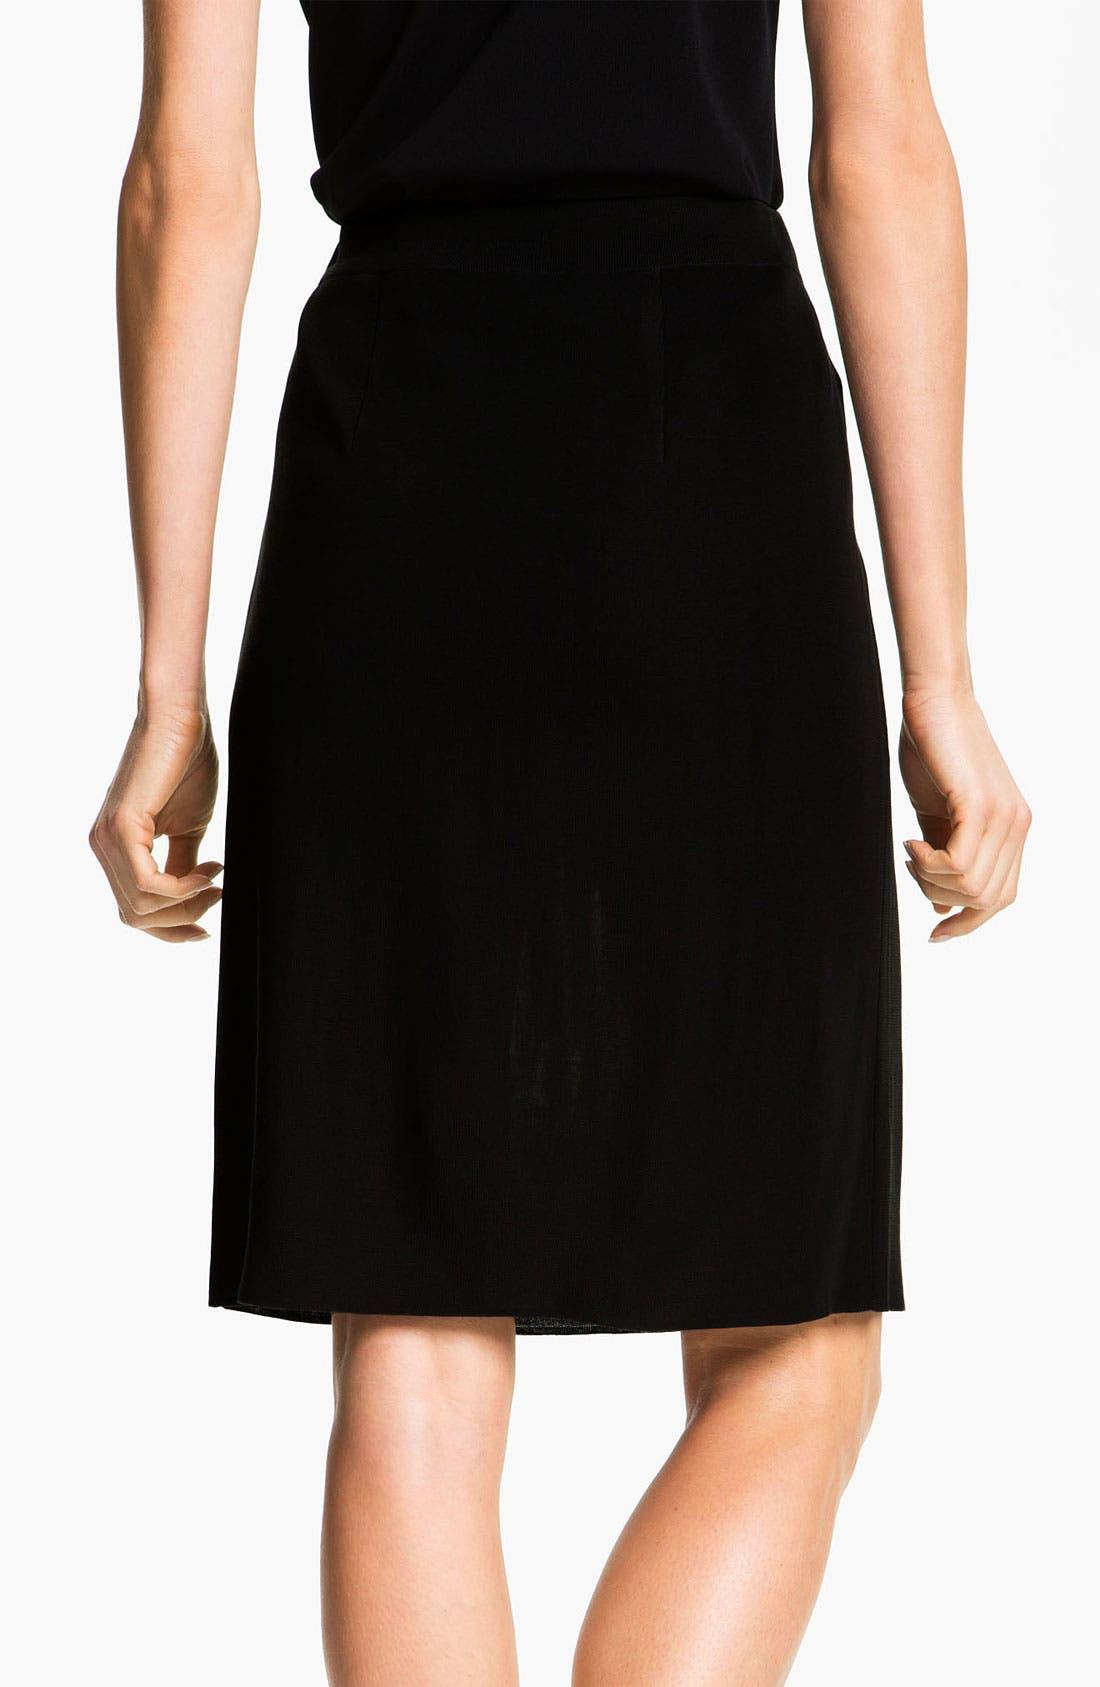 Alternate Image 2  - Misook Pull-On Skirt (Petite) (Online Only)